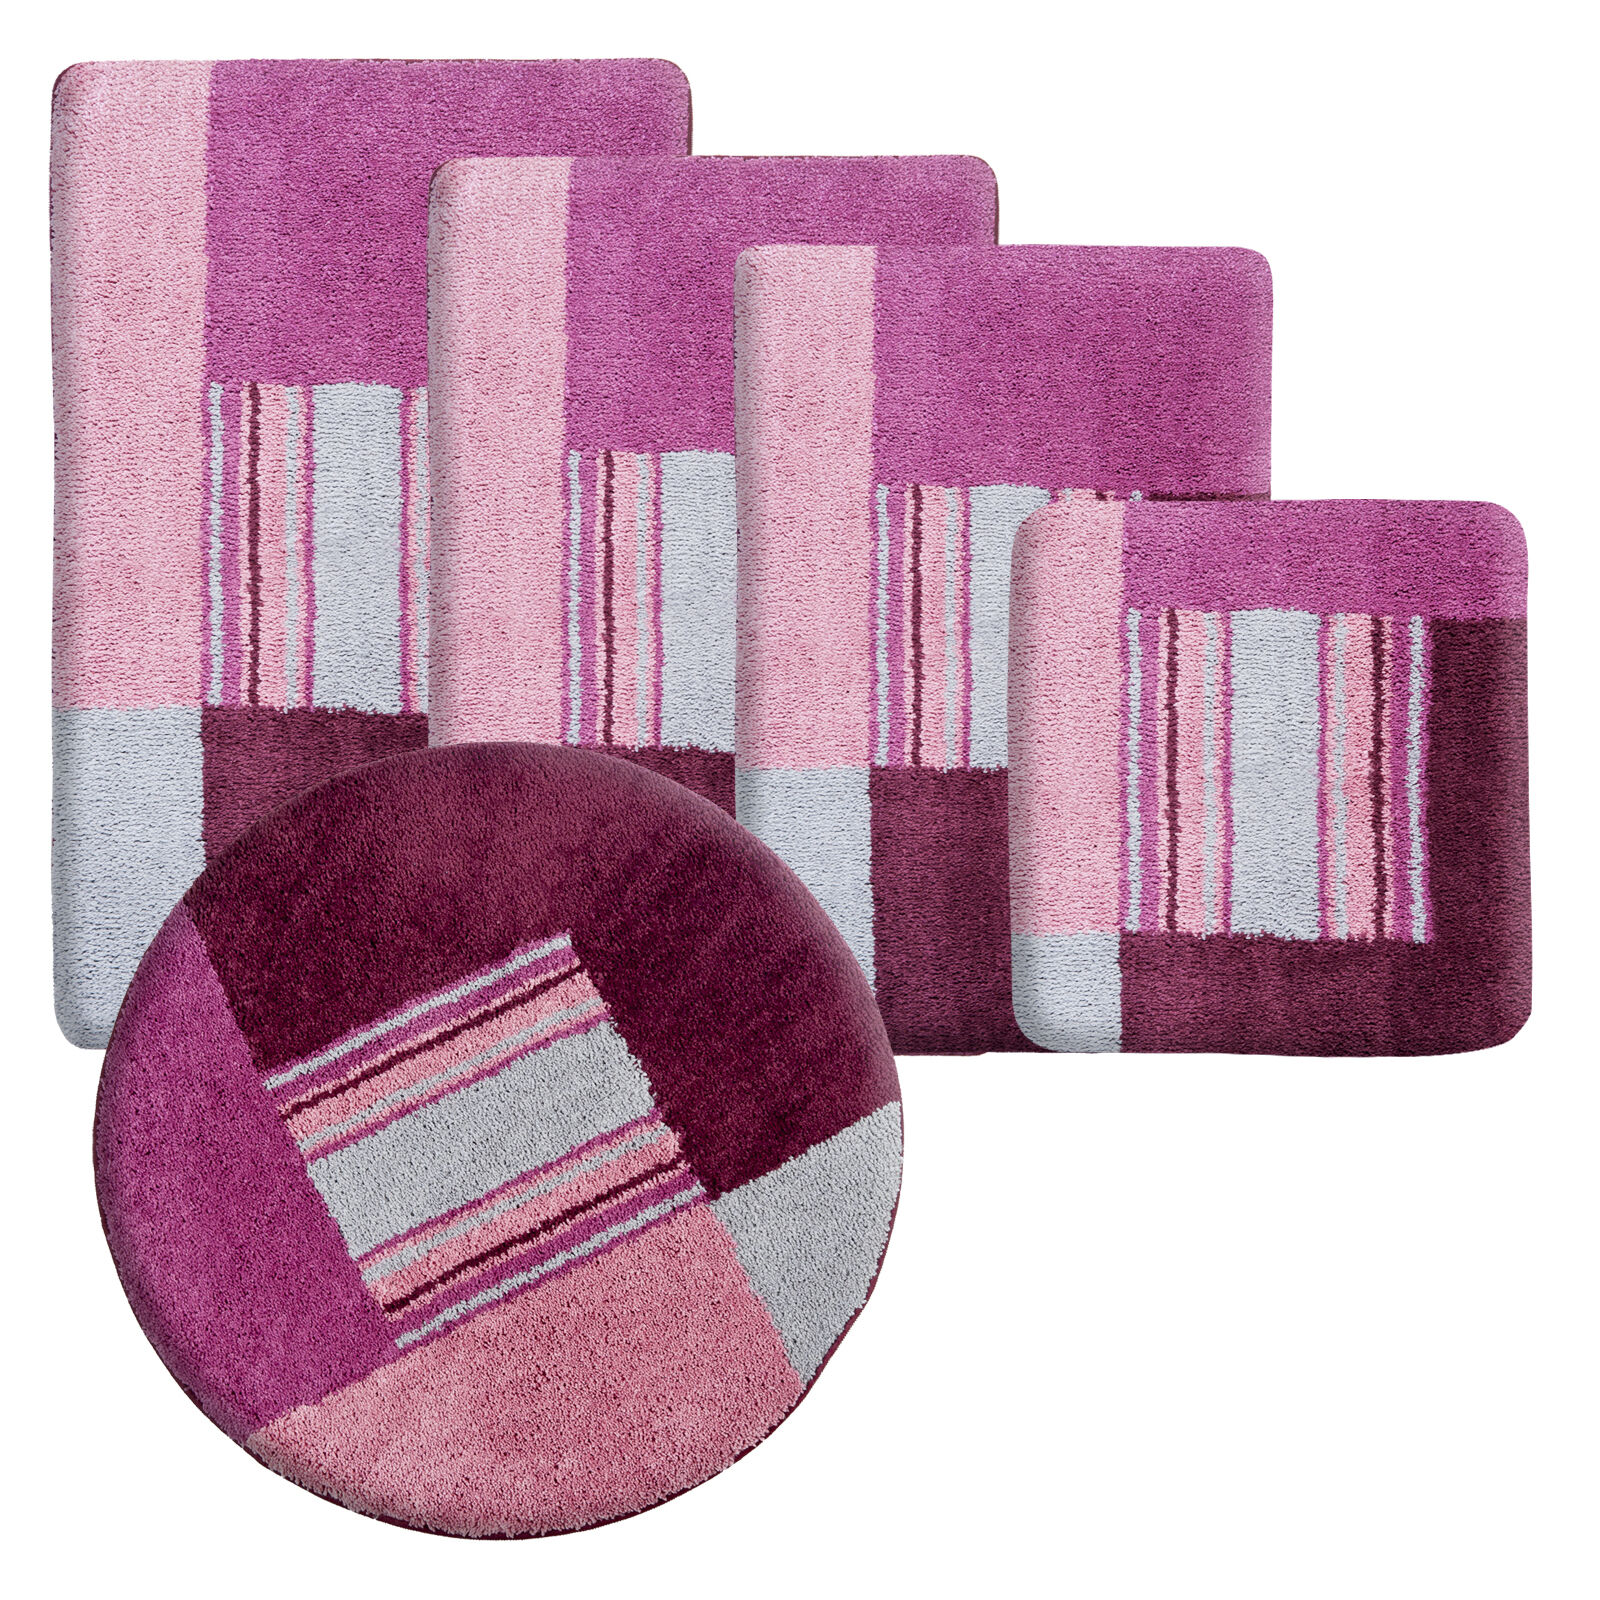 badematte uni badgarnitur duschvorleger badeteppich badvorleger badteppich matte eur 7 99. Black Bedroom Furniture Sets. Home Design Ideas